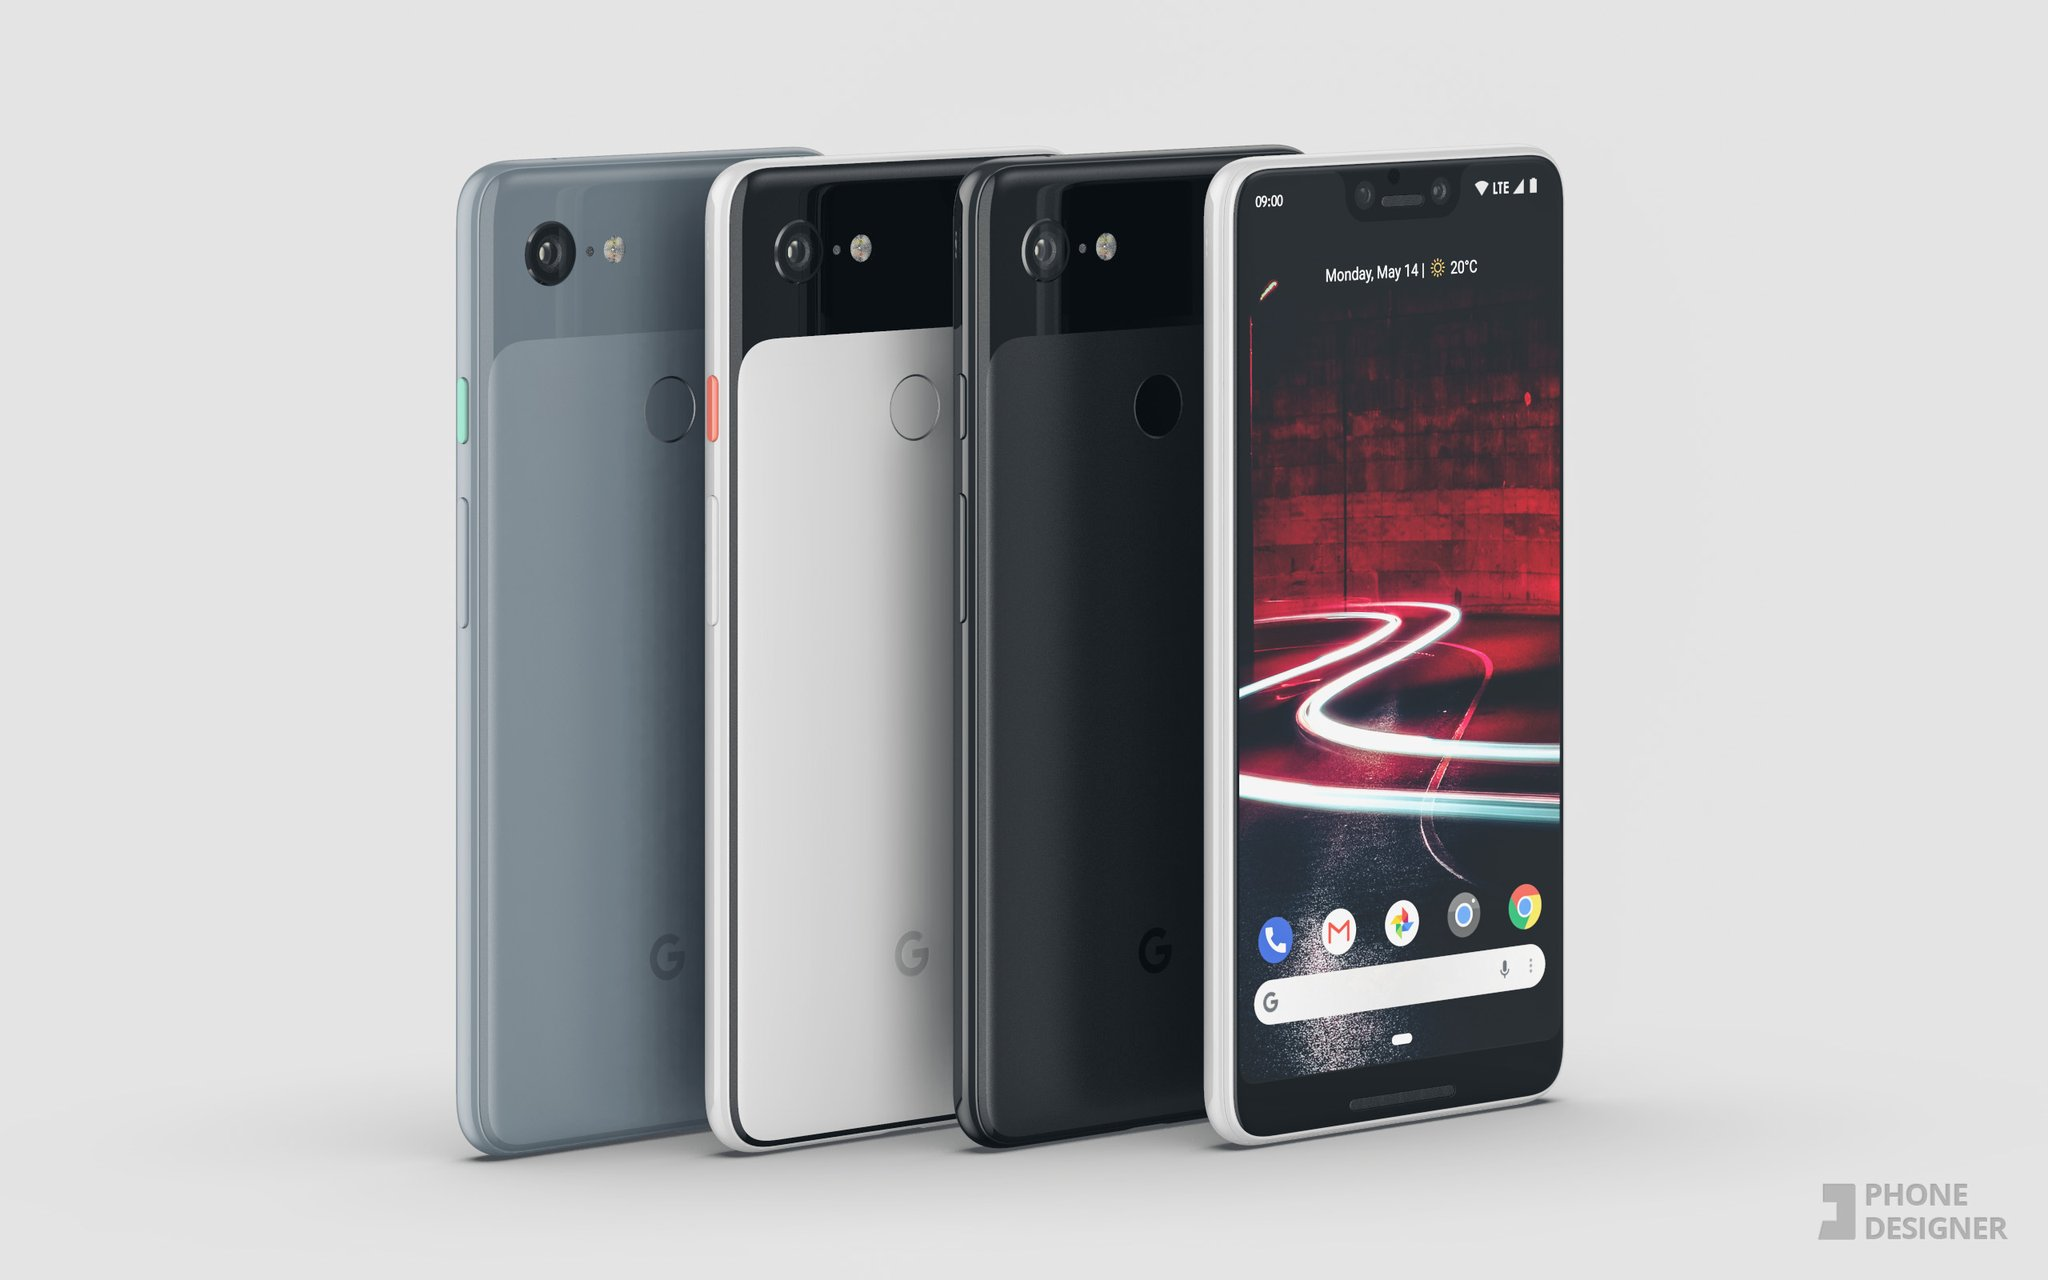 Google Pixel, Google Pixel 3XL, Pixel 3XL, Render Google Pixel 3XL, Render, Render Pixel 3XL, Pixel 3XL render, Pixel 3XL leak, leaked image Pixel 3XL, Pixel 3XL colours